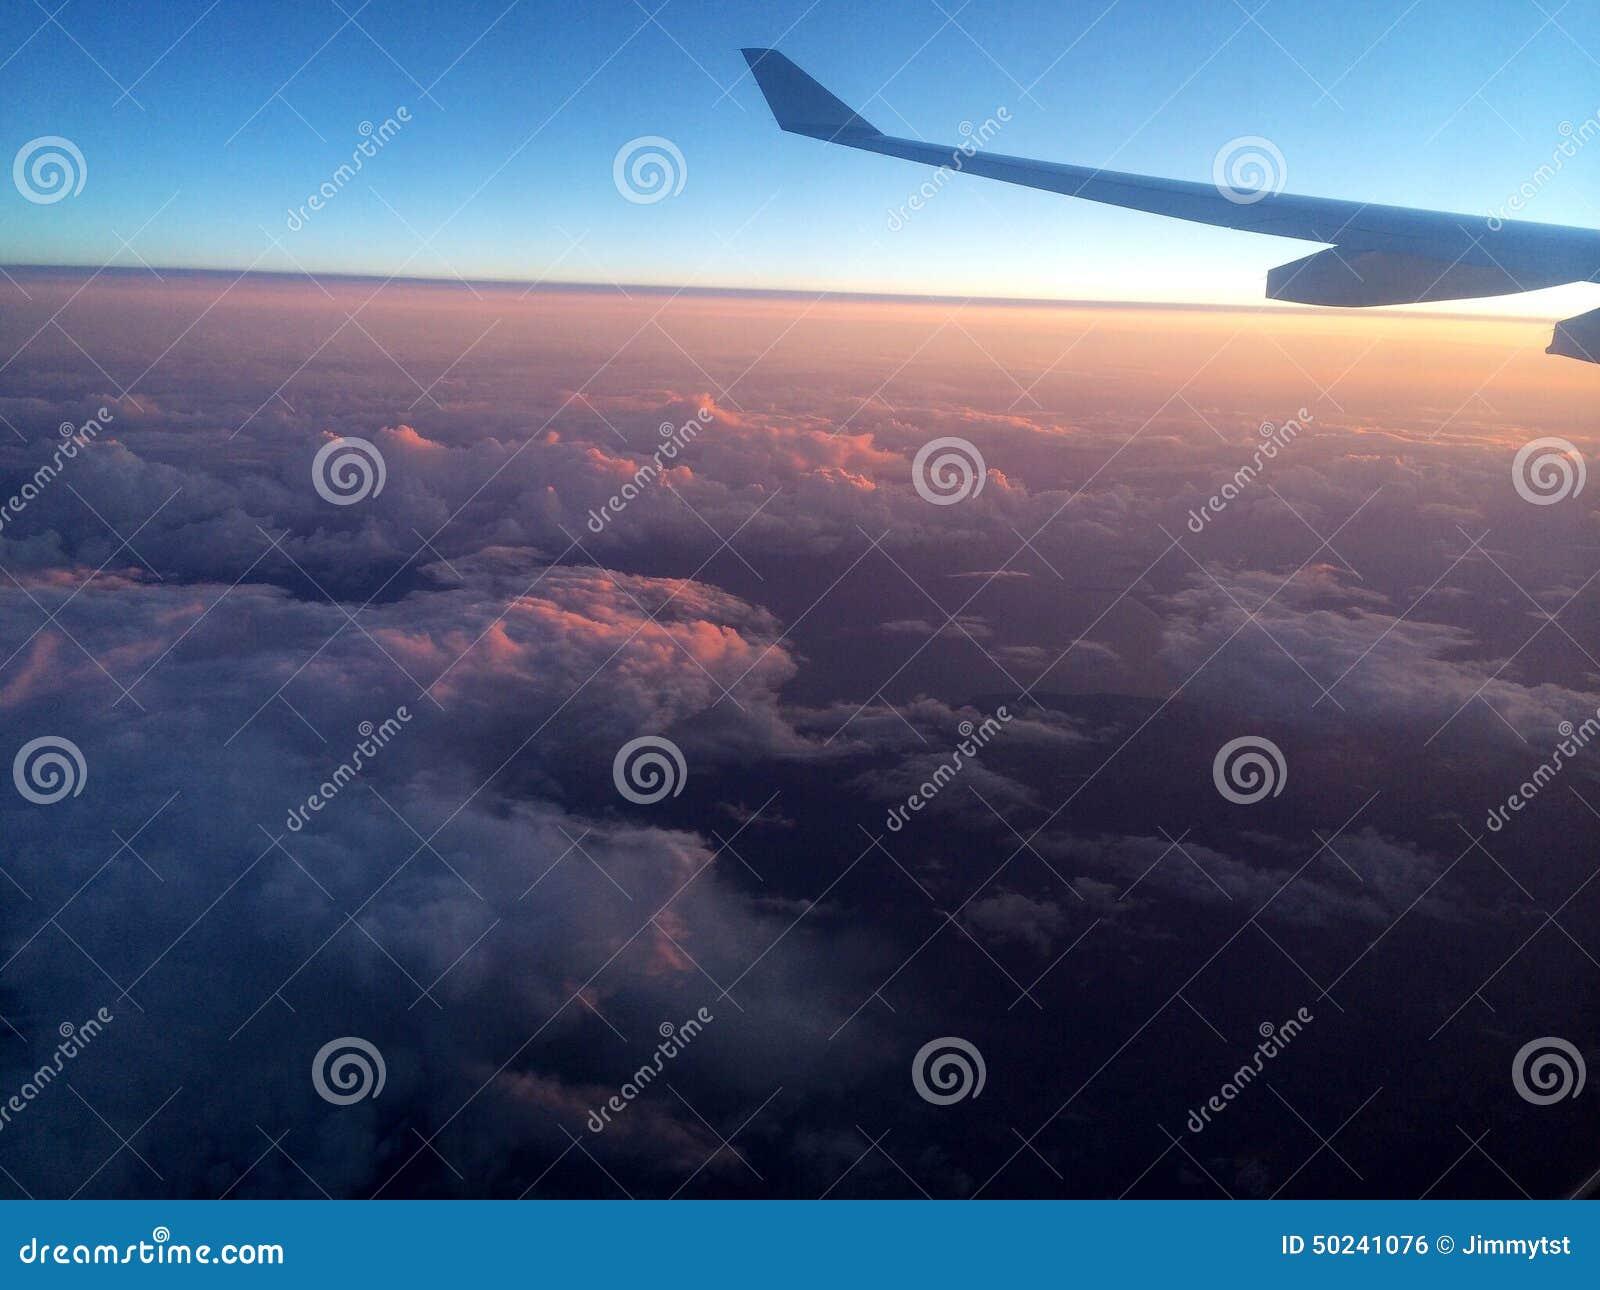 Vista aérea do céu nebuloso de cima de